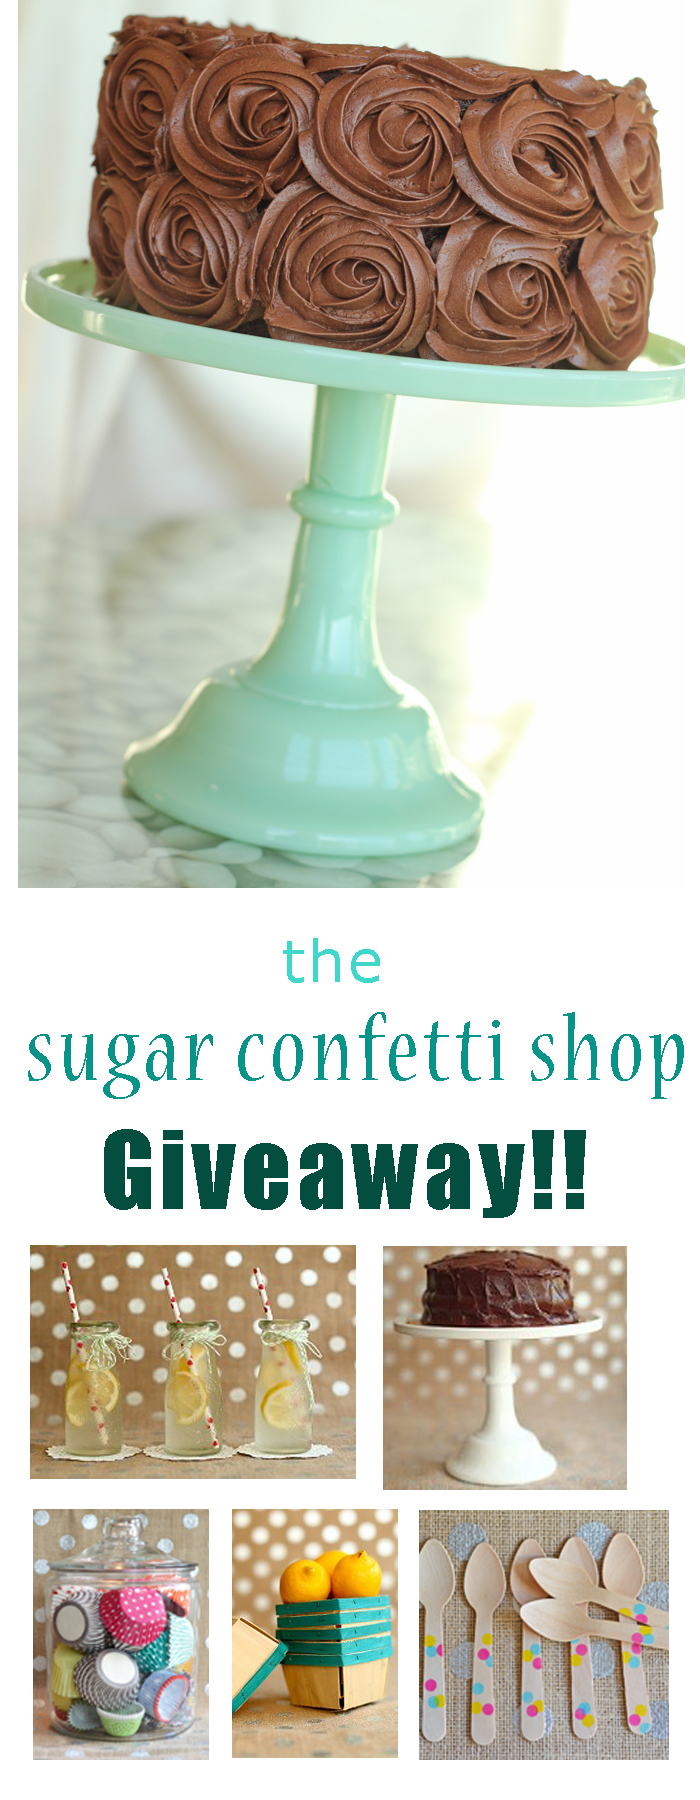 Sugar Confetti Shop giveaway!